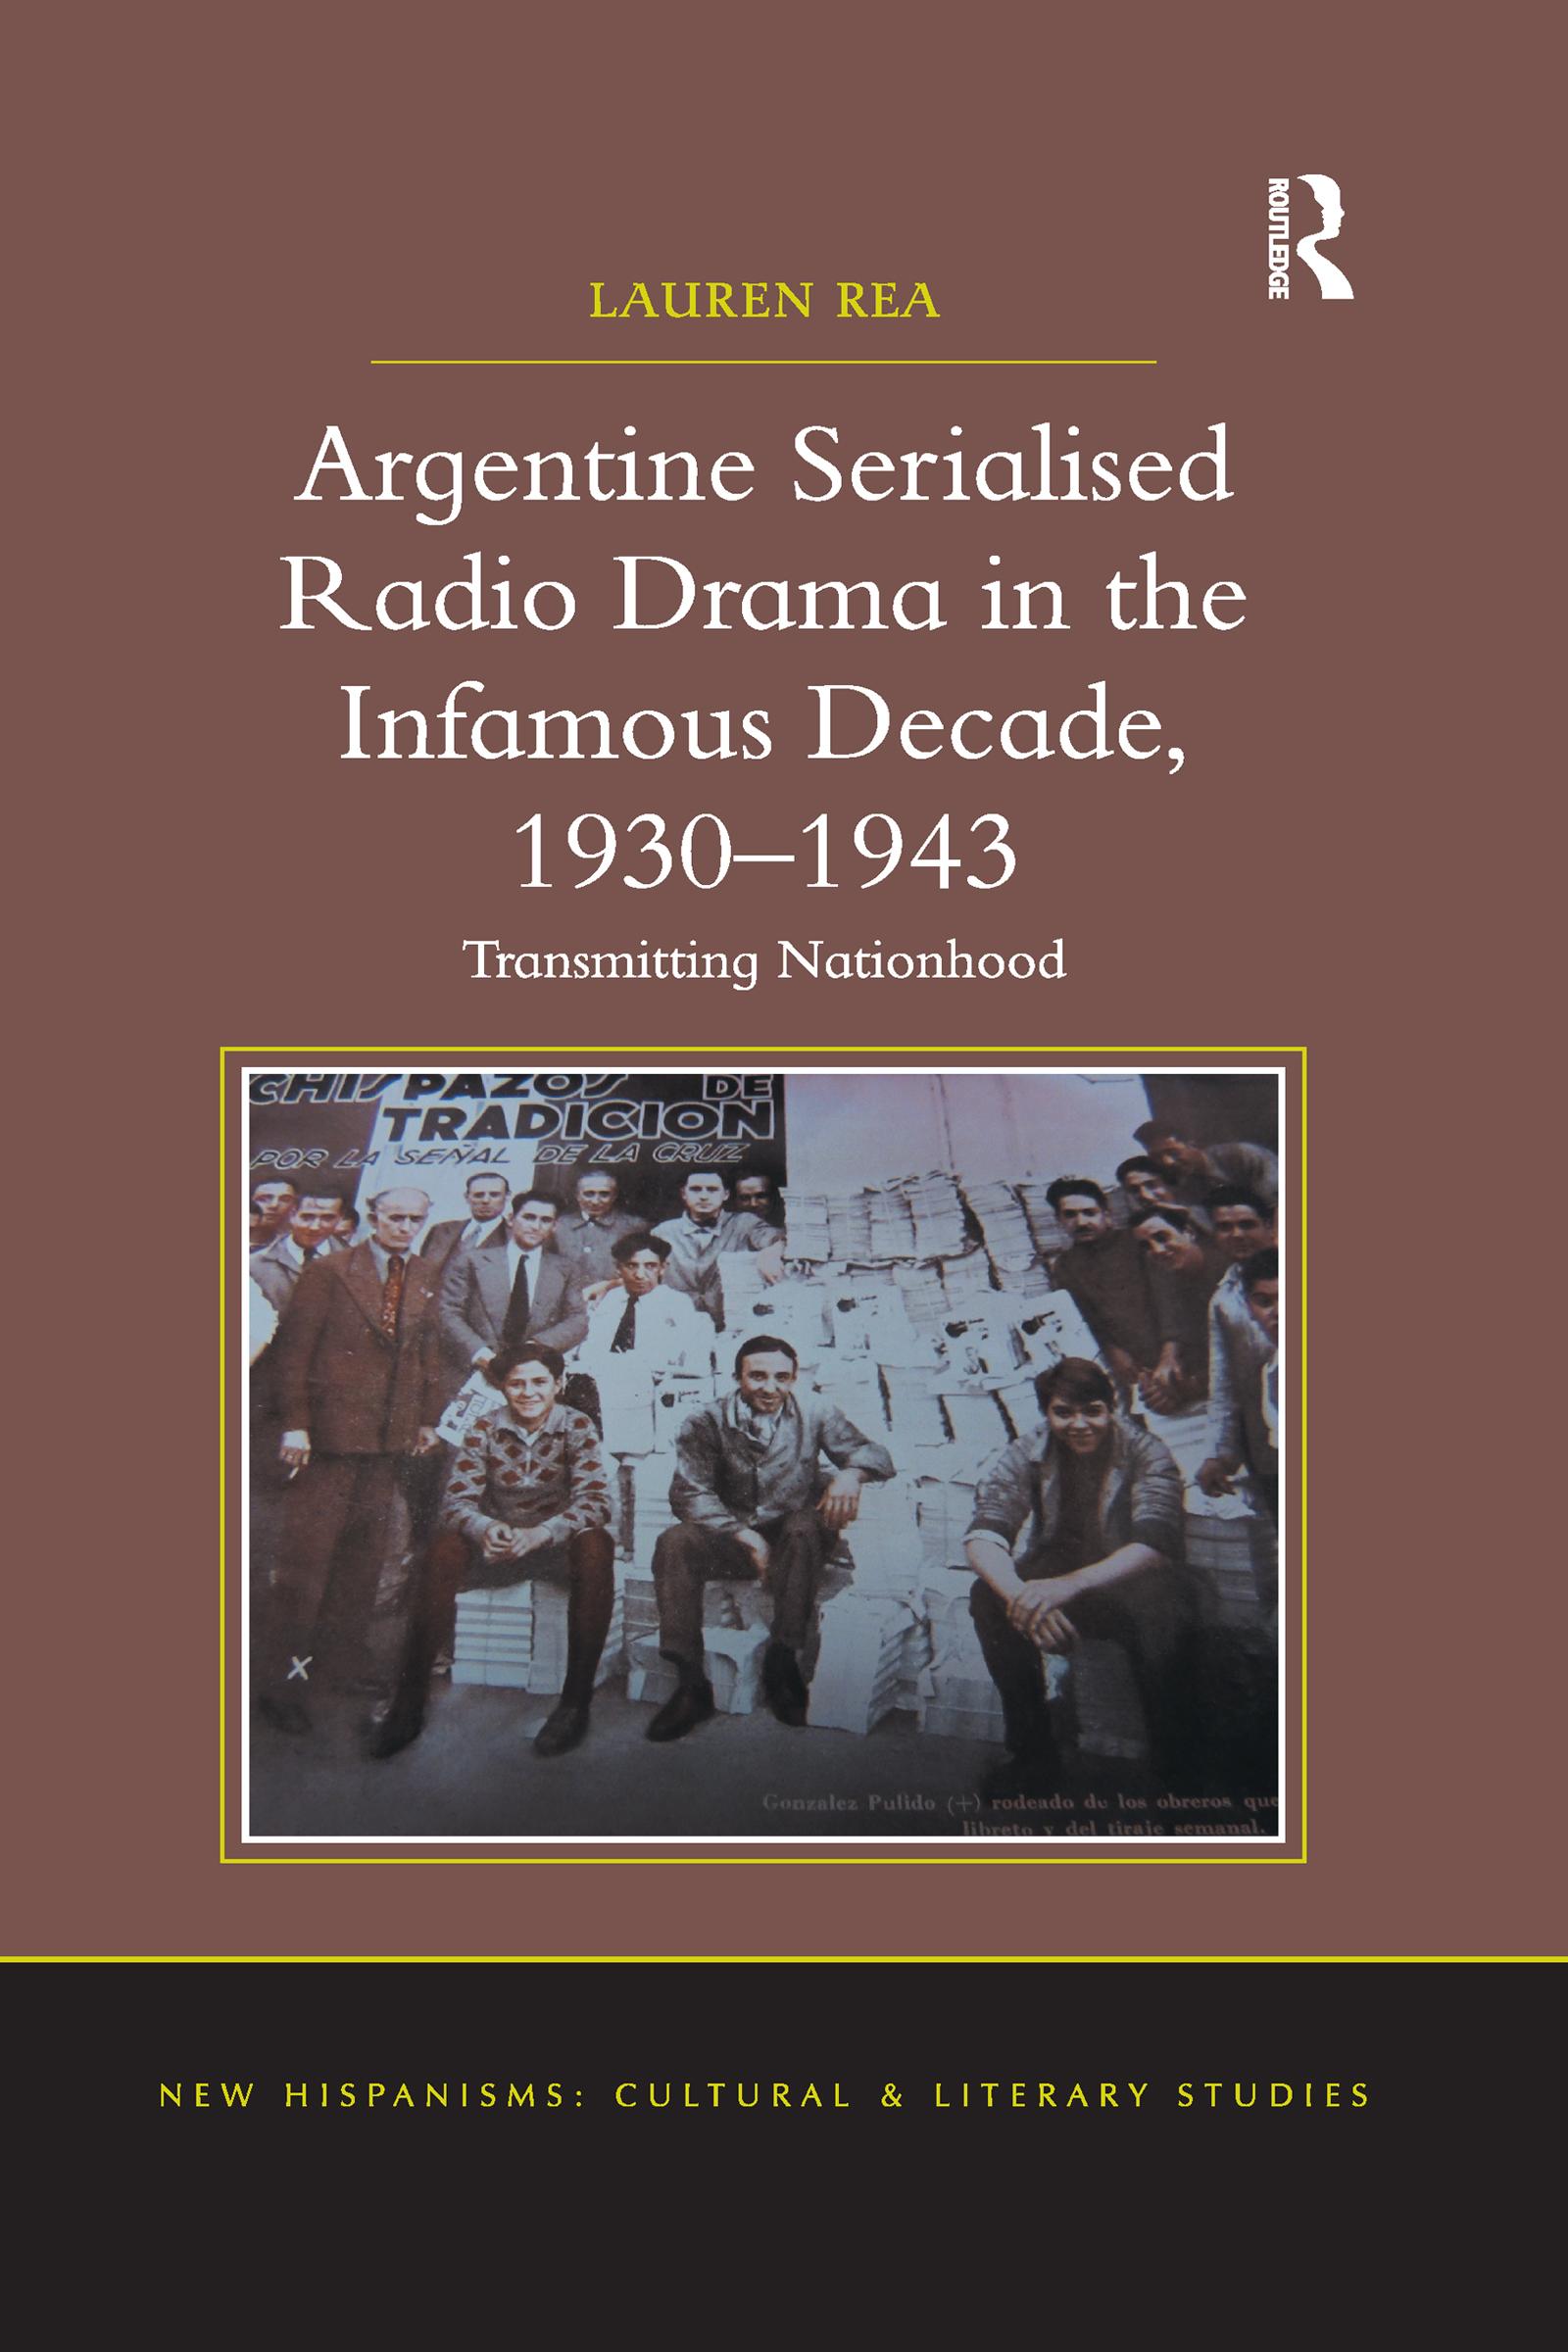 Argentine Serialised Radio Drama in the Infamous Decade, 1930–1943